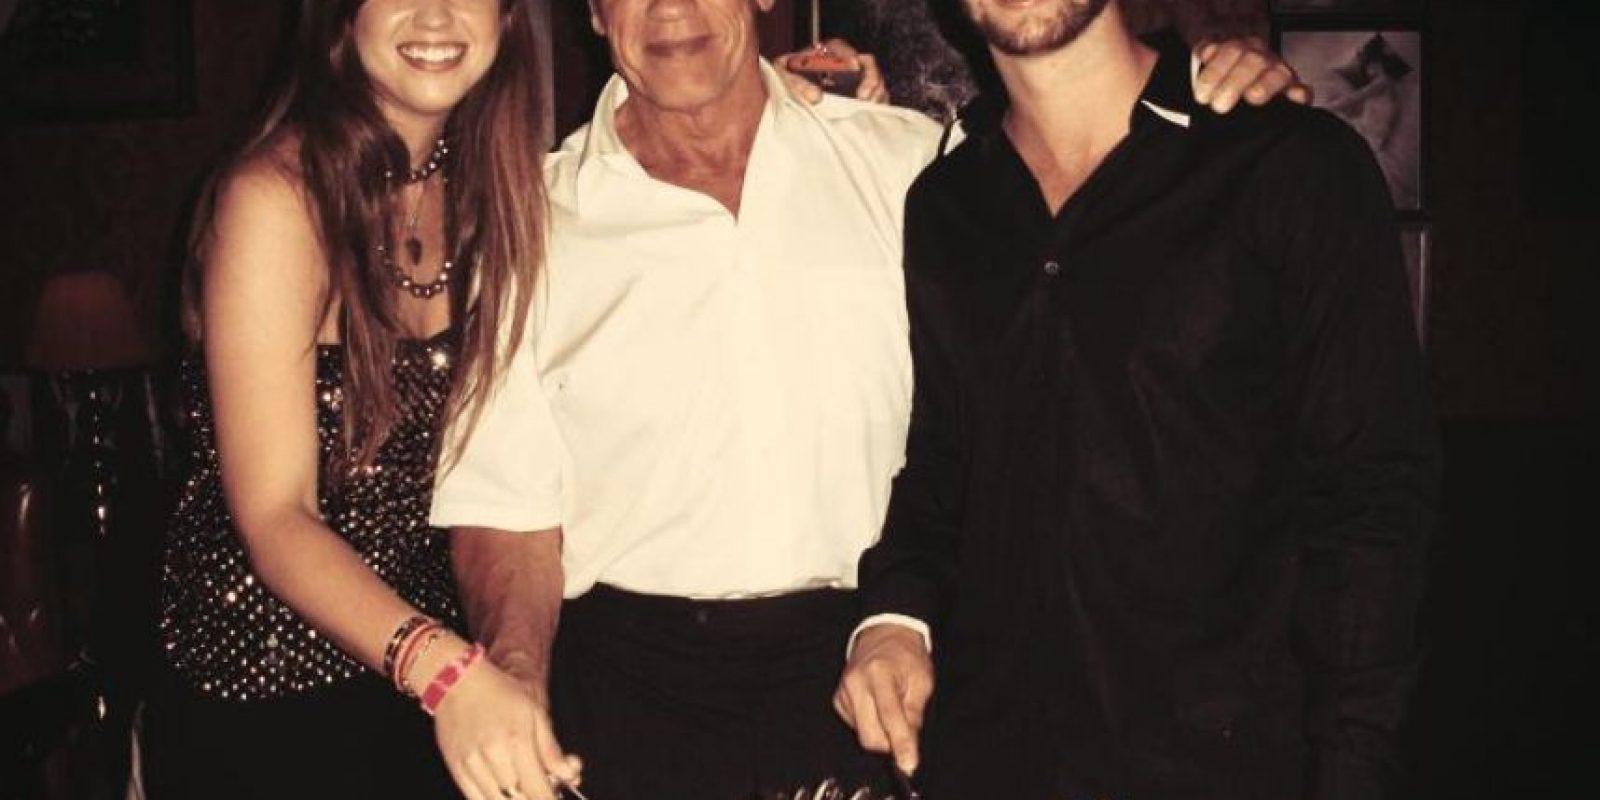 Le gusta estar en familia Foto:Facebook Patrick Schwarzenegger